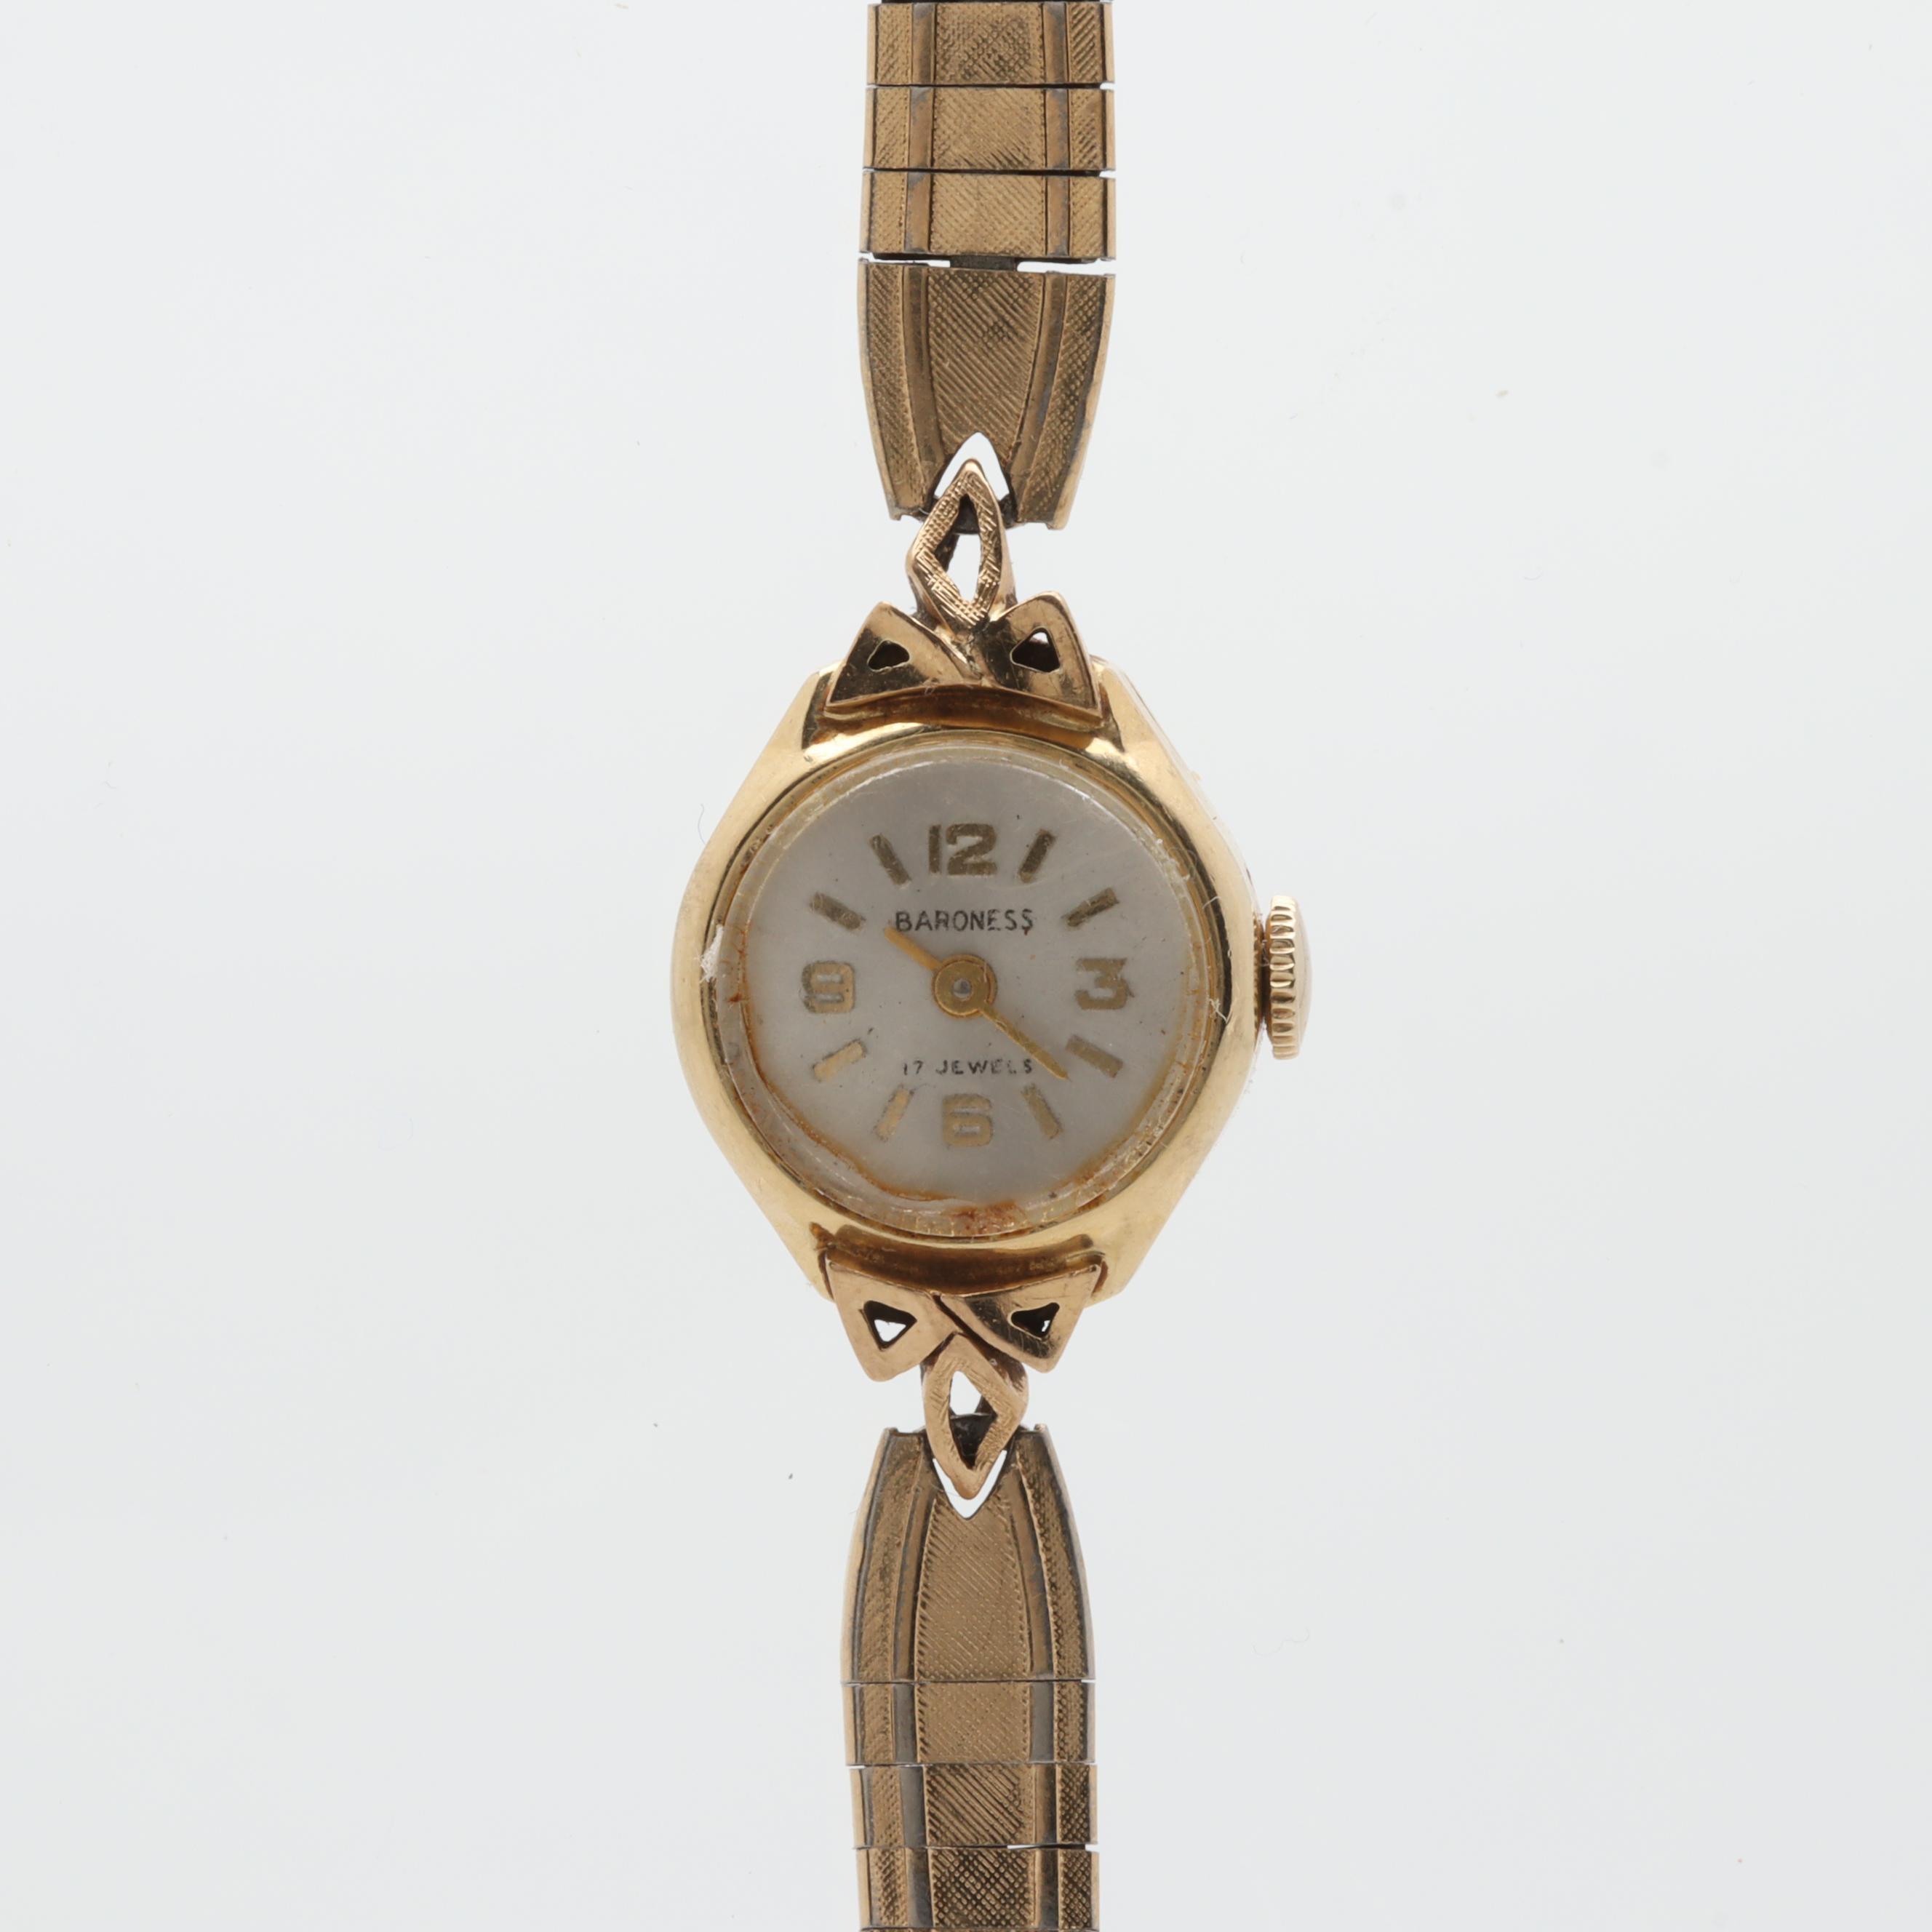 Baroness 14K Yellow Gold Wristwatch